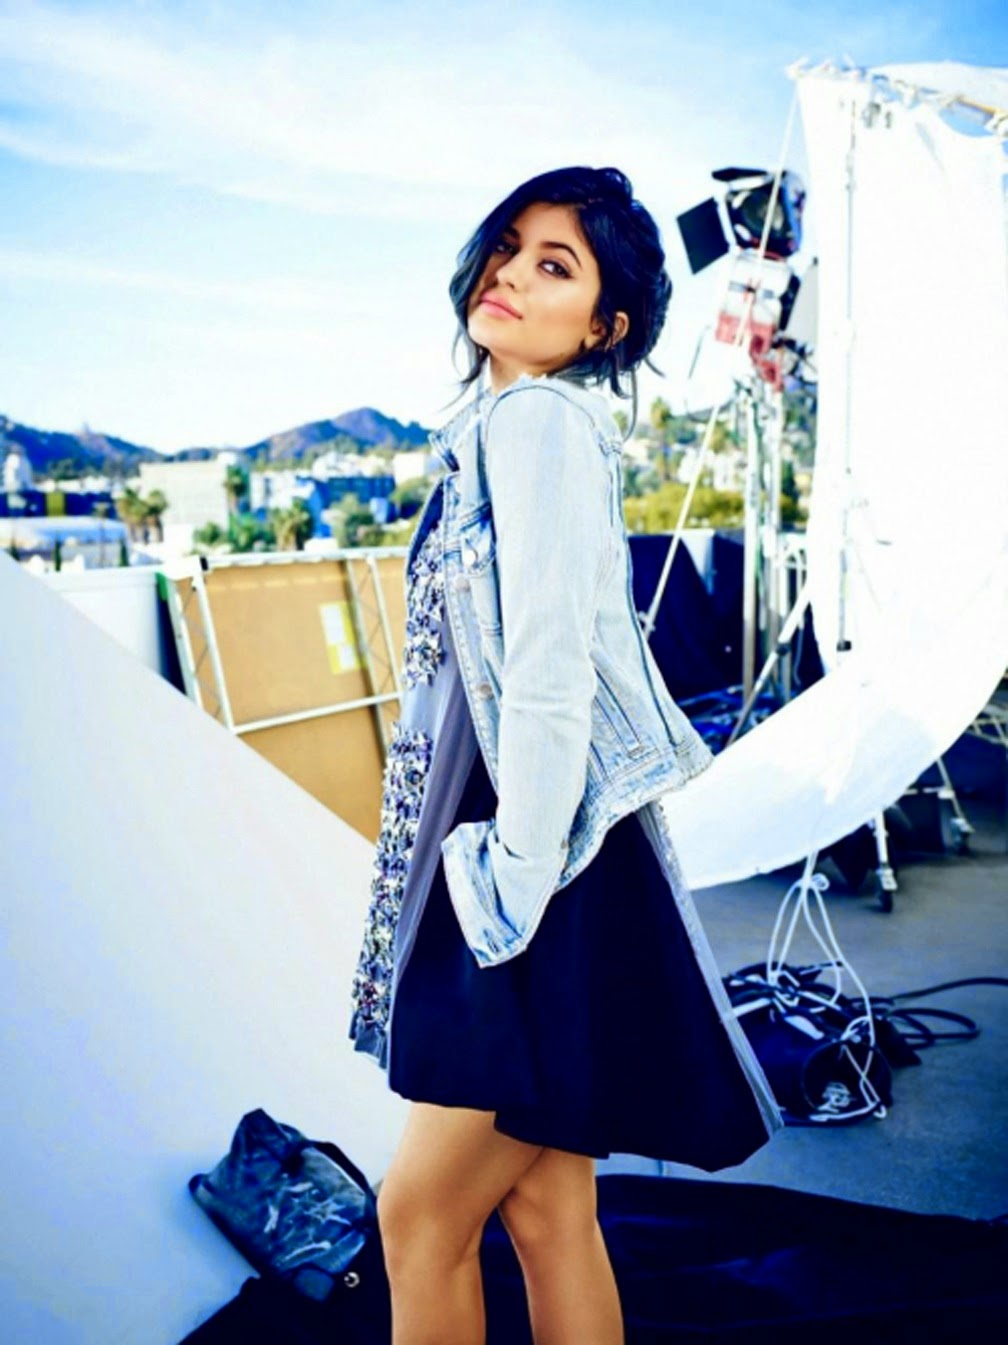 Kylie Jenner Cosmopolitan Magazine